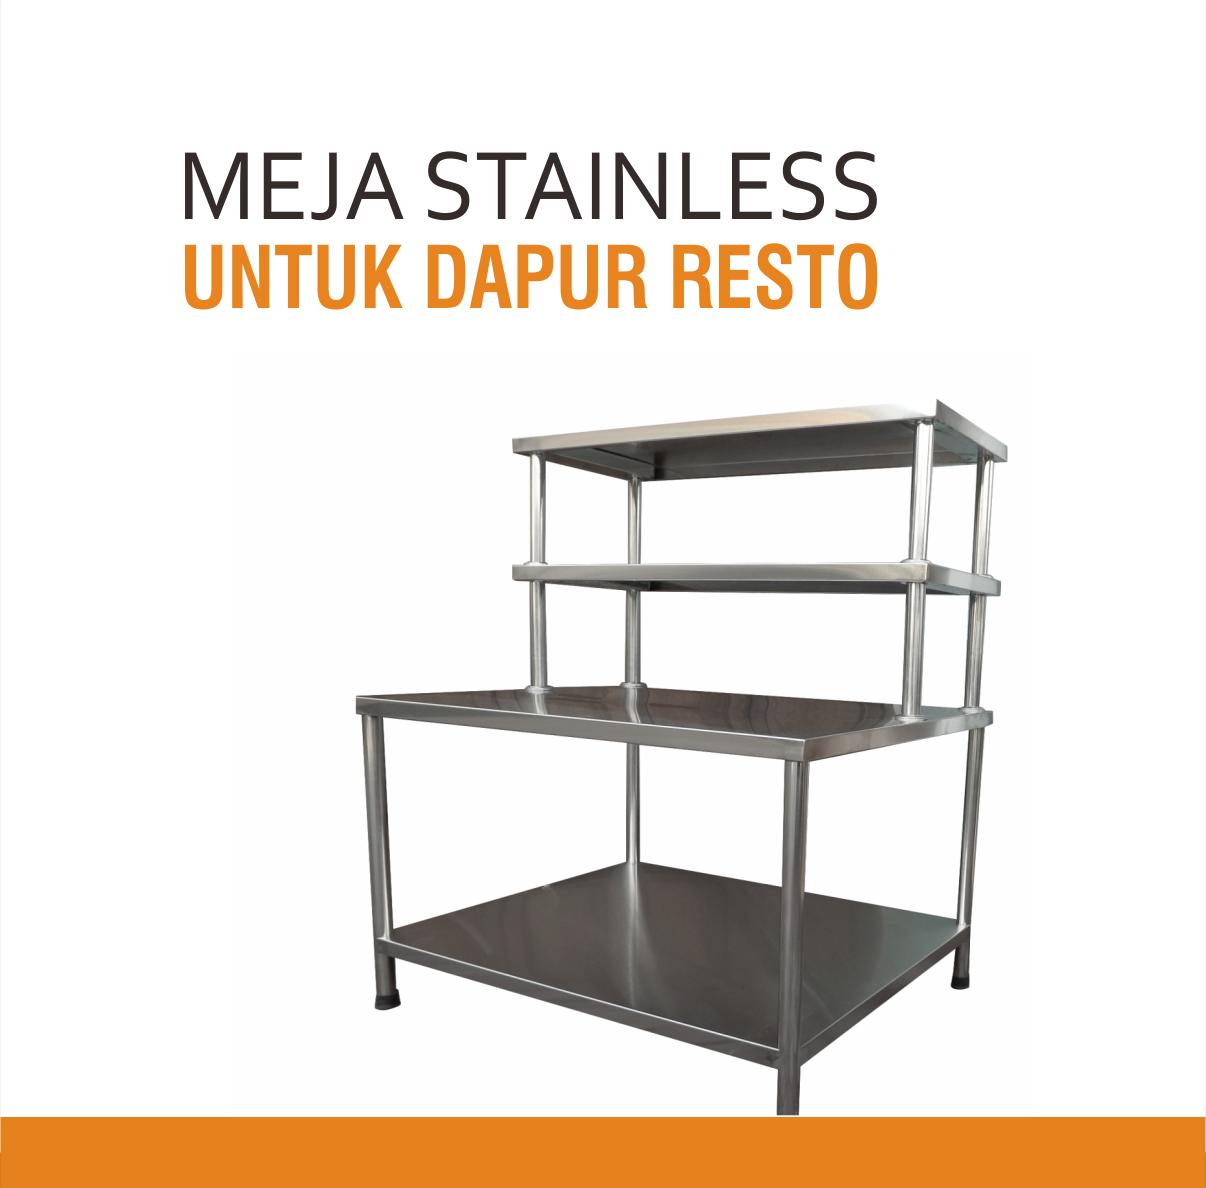 Harga Meja Dapur Stainless Steel Desainrumahid com